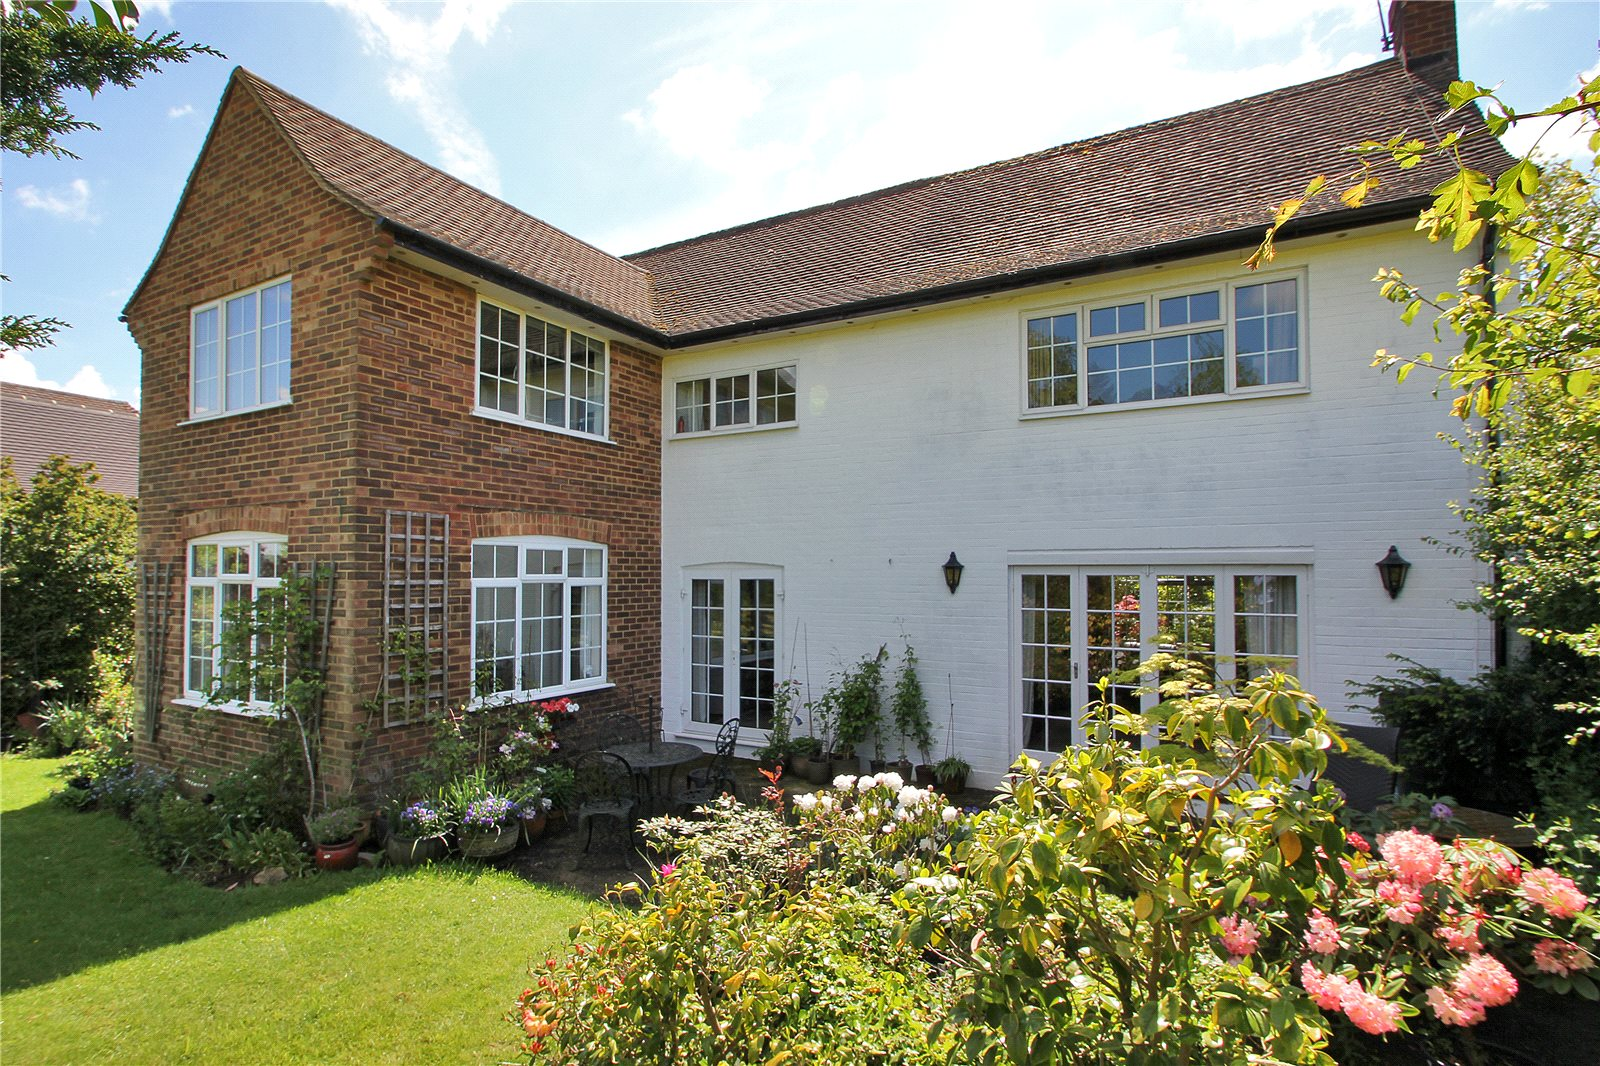 Single Family Home for Sale at Downsview Road, Sevenoaks, Kent, TN13 Sevenoaks, England